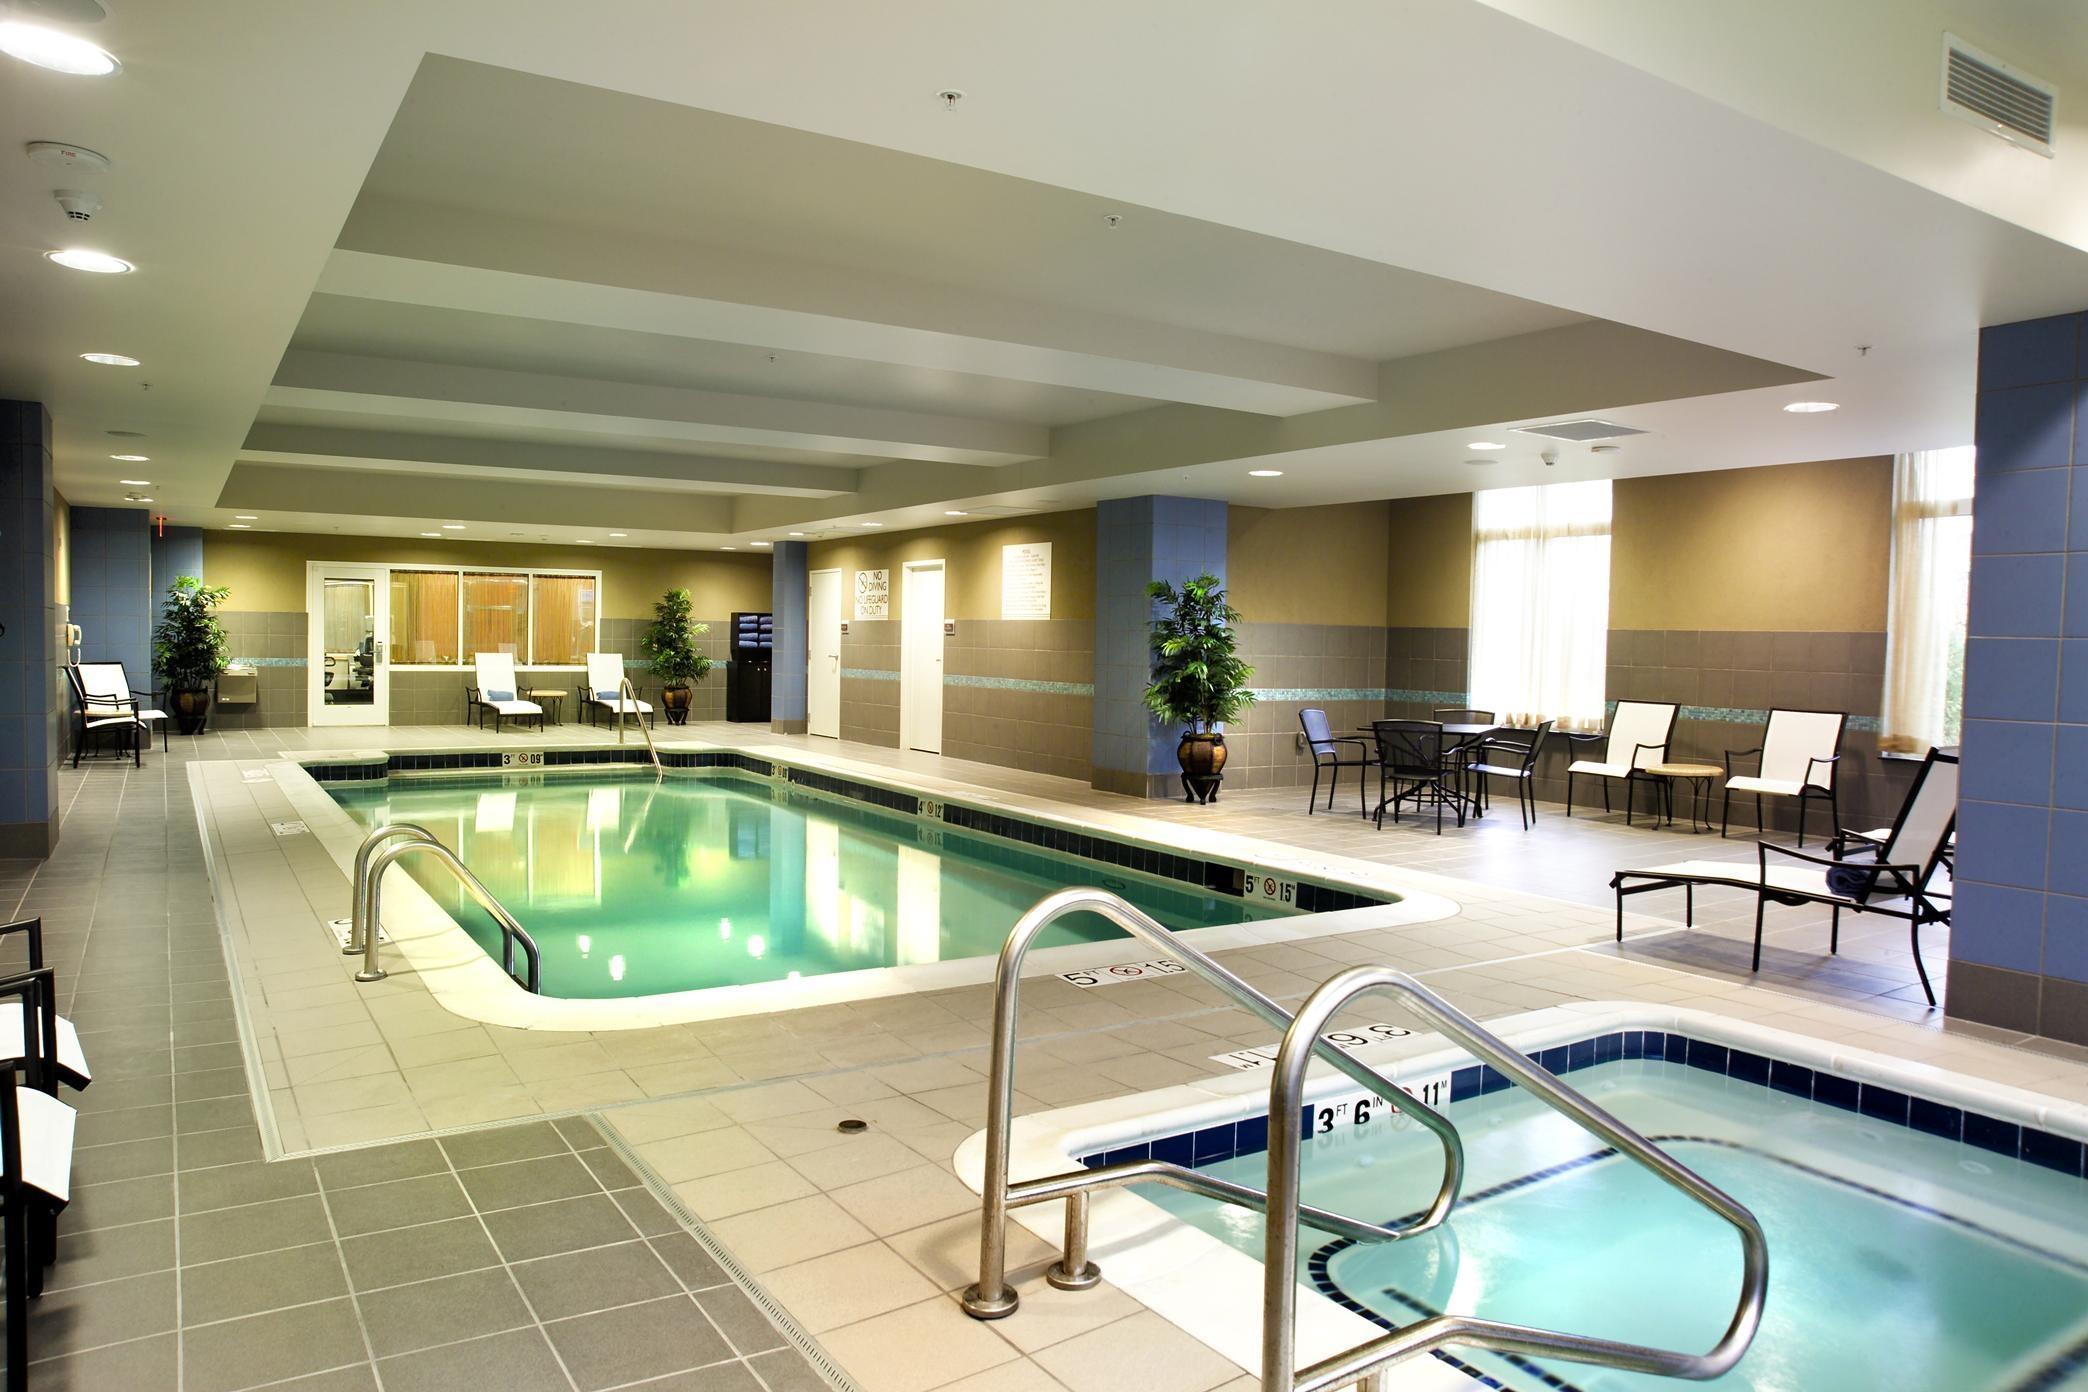 Hilton Garden Inn Toledo Perrysburg Perrysburg Oh Business Directory